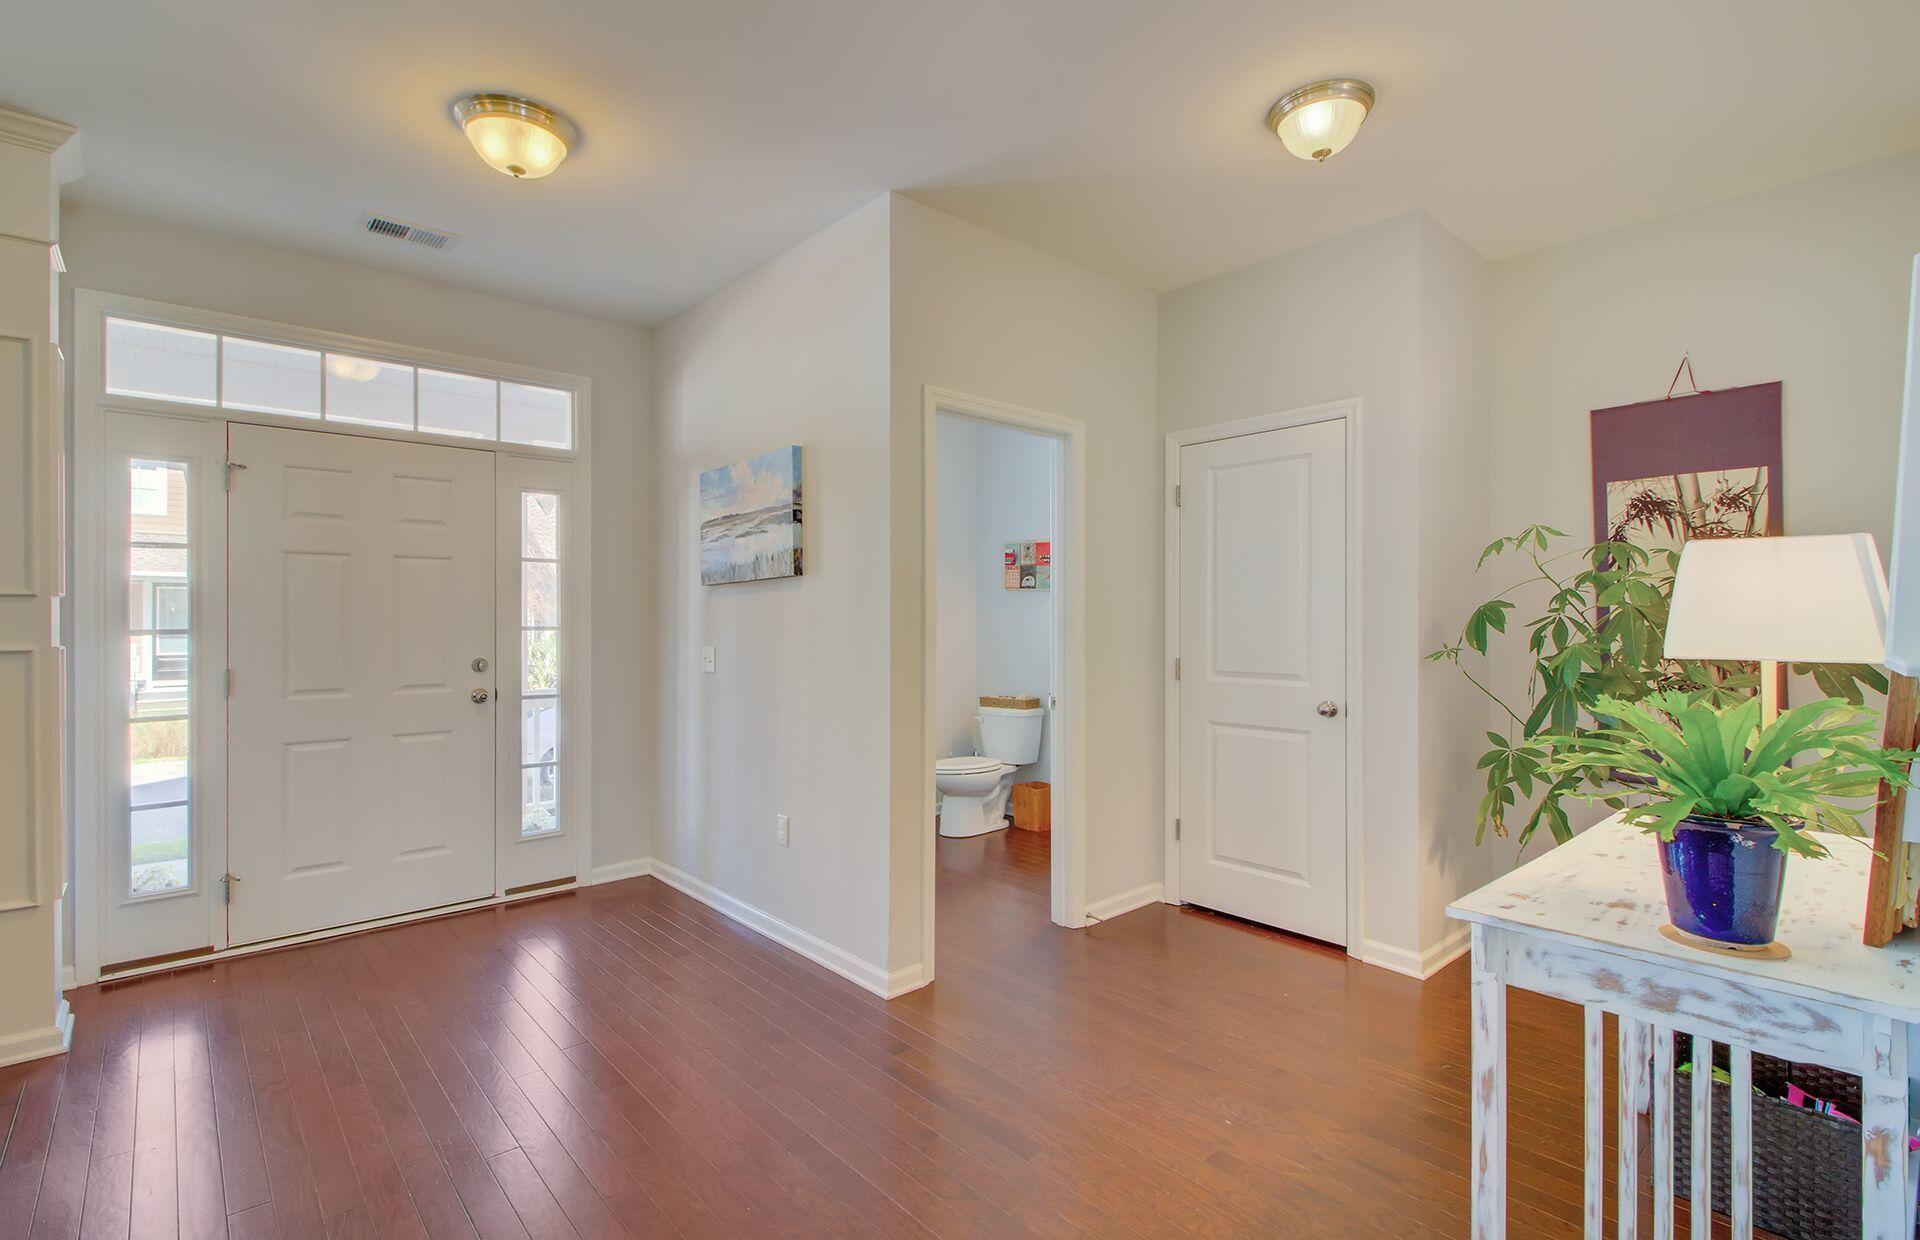 Oak Terrace Preserve Homes For Sale - 4967 Liberty Park, North Charleston, SC - 4